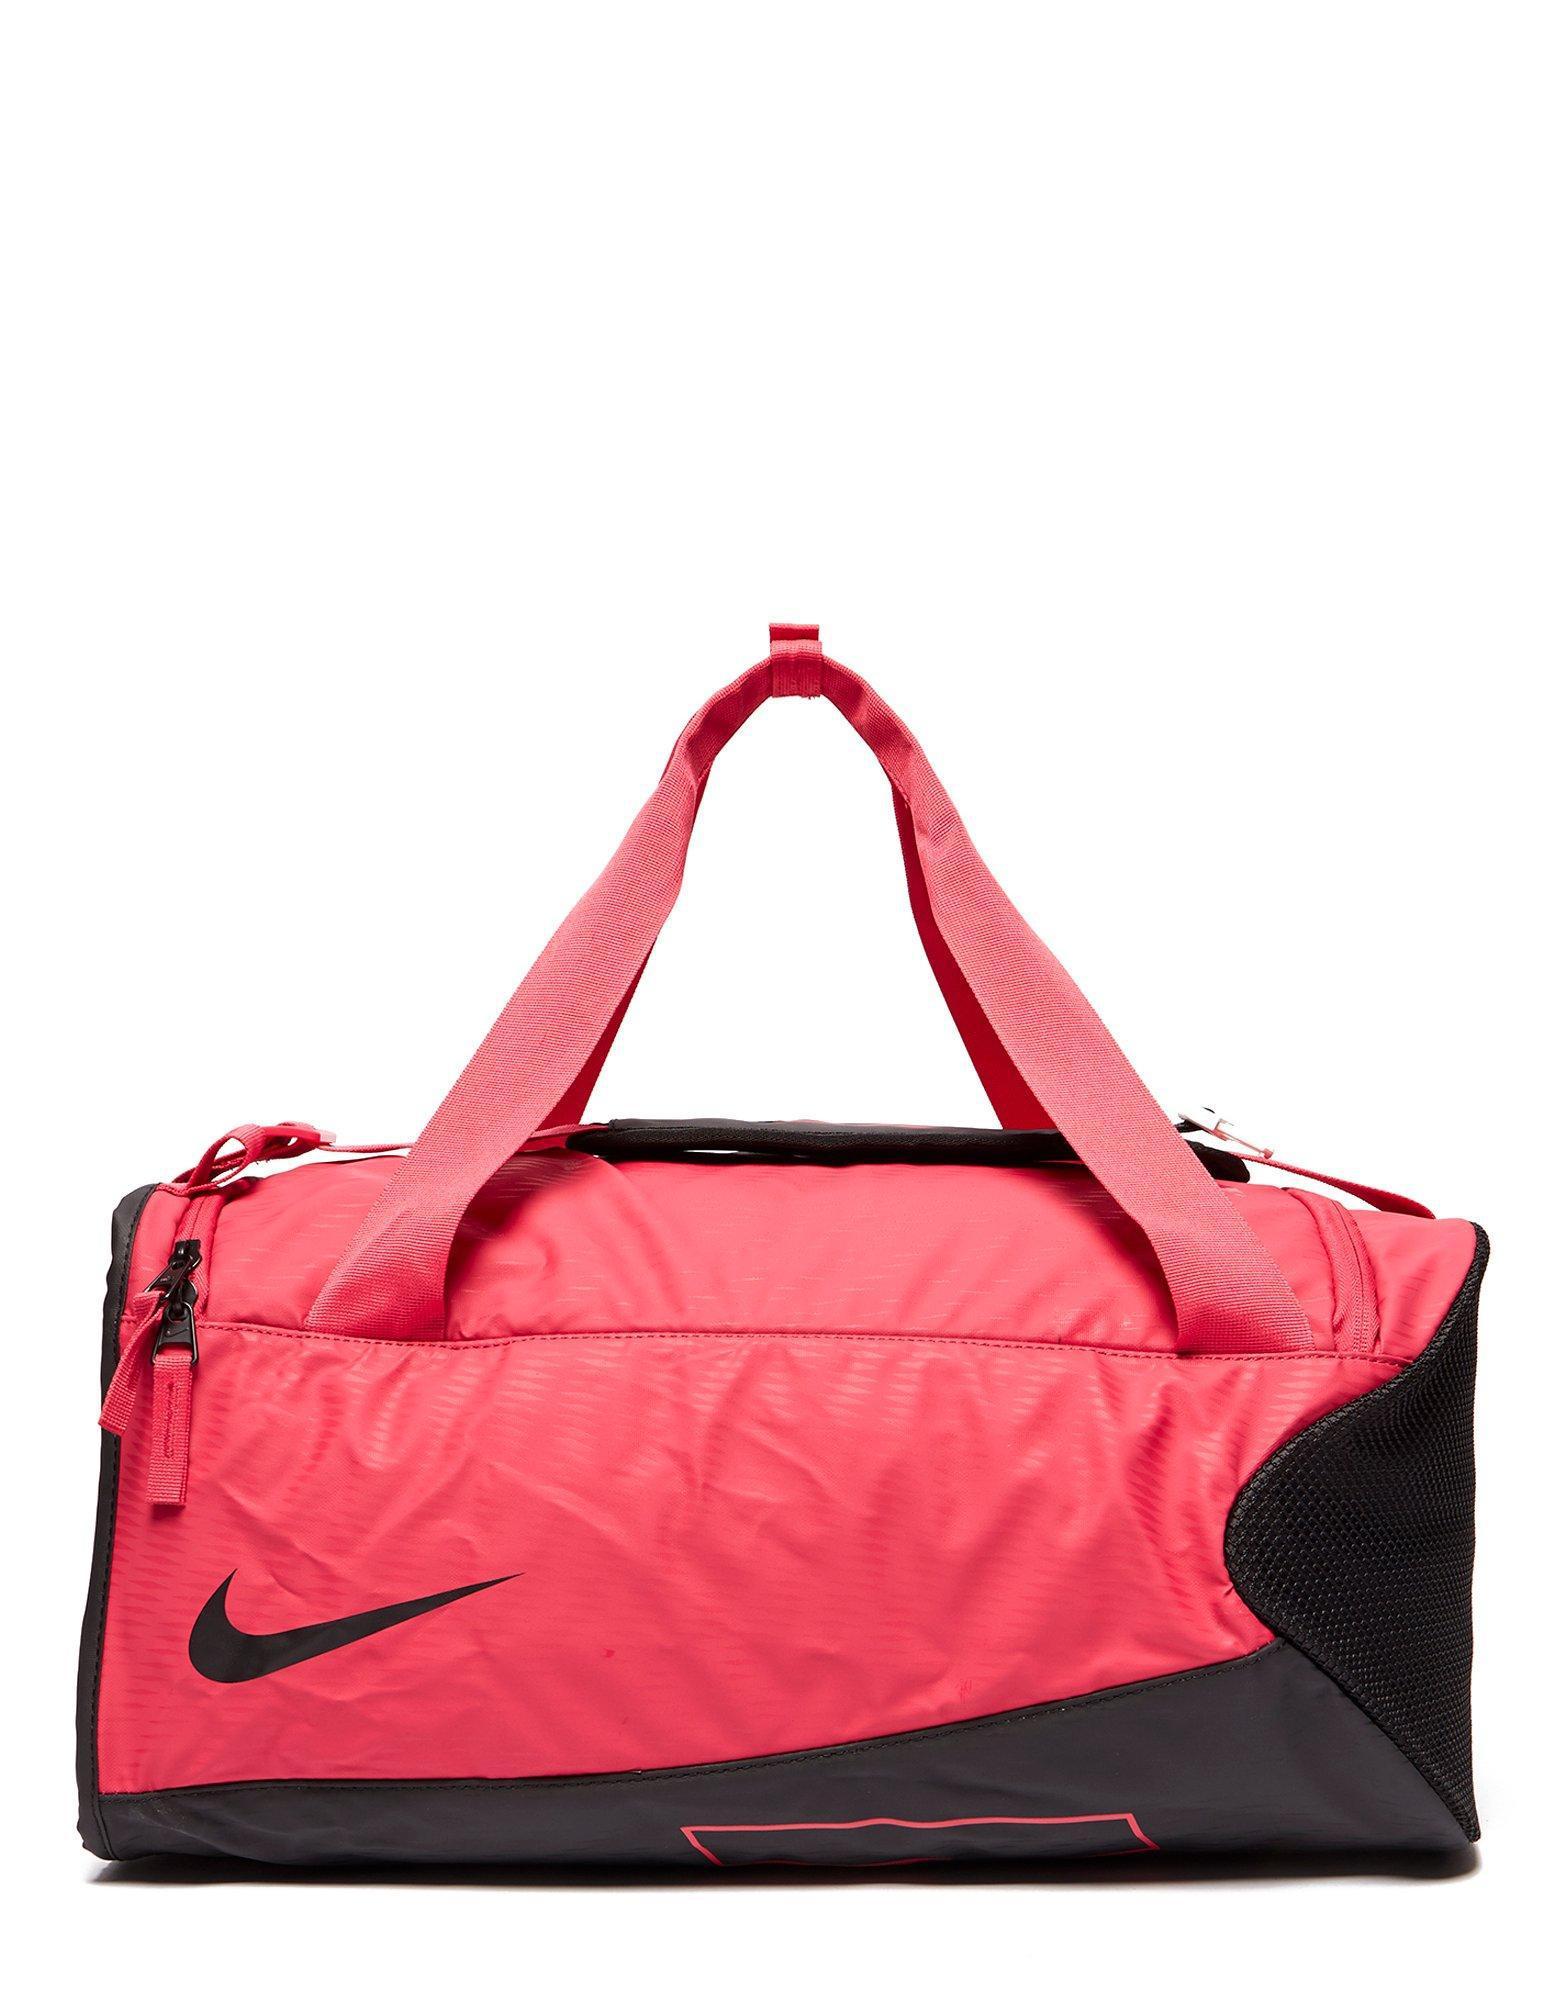 5f50598b1ea508 Nike Alpha Adapt Crossbody Duffle Bag in Pink for Men - Lyst